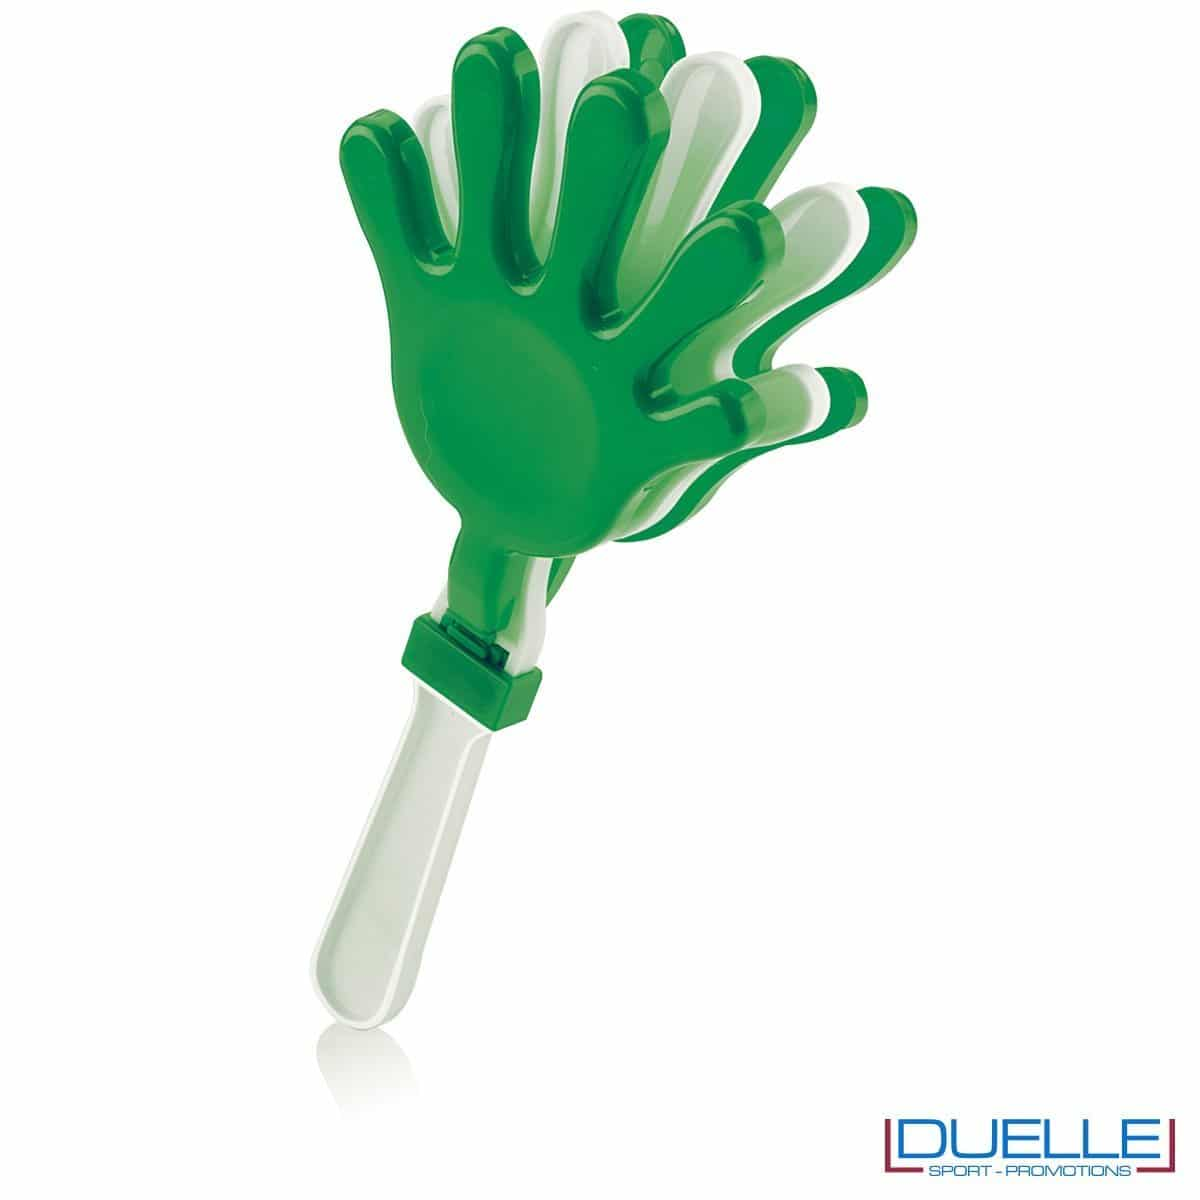 gadget tifoserie - manina per feste colore verde -gadget estate, gadget feste